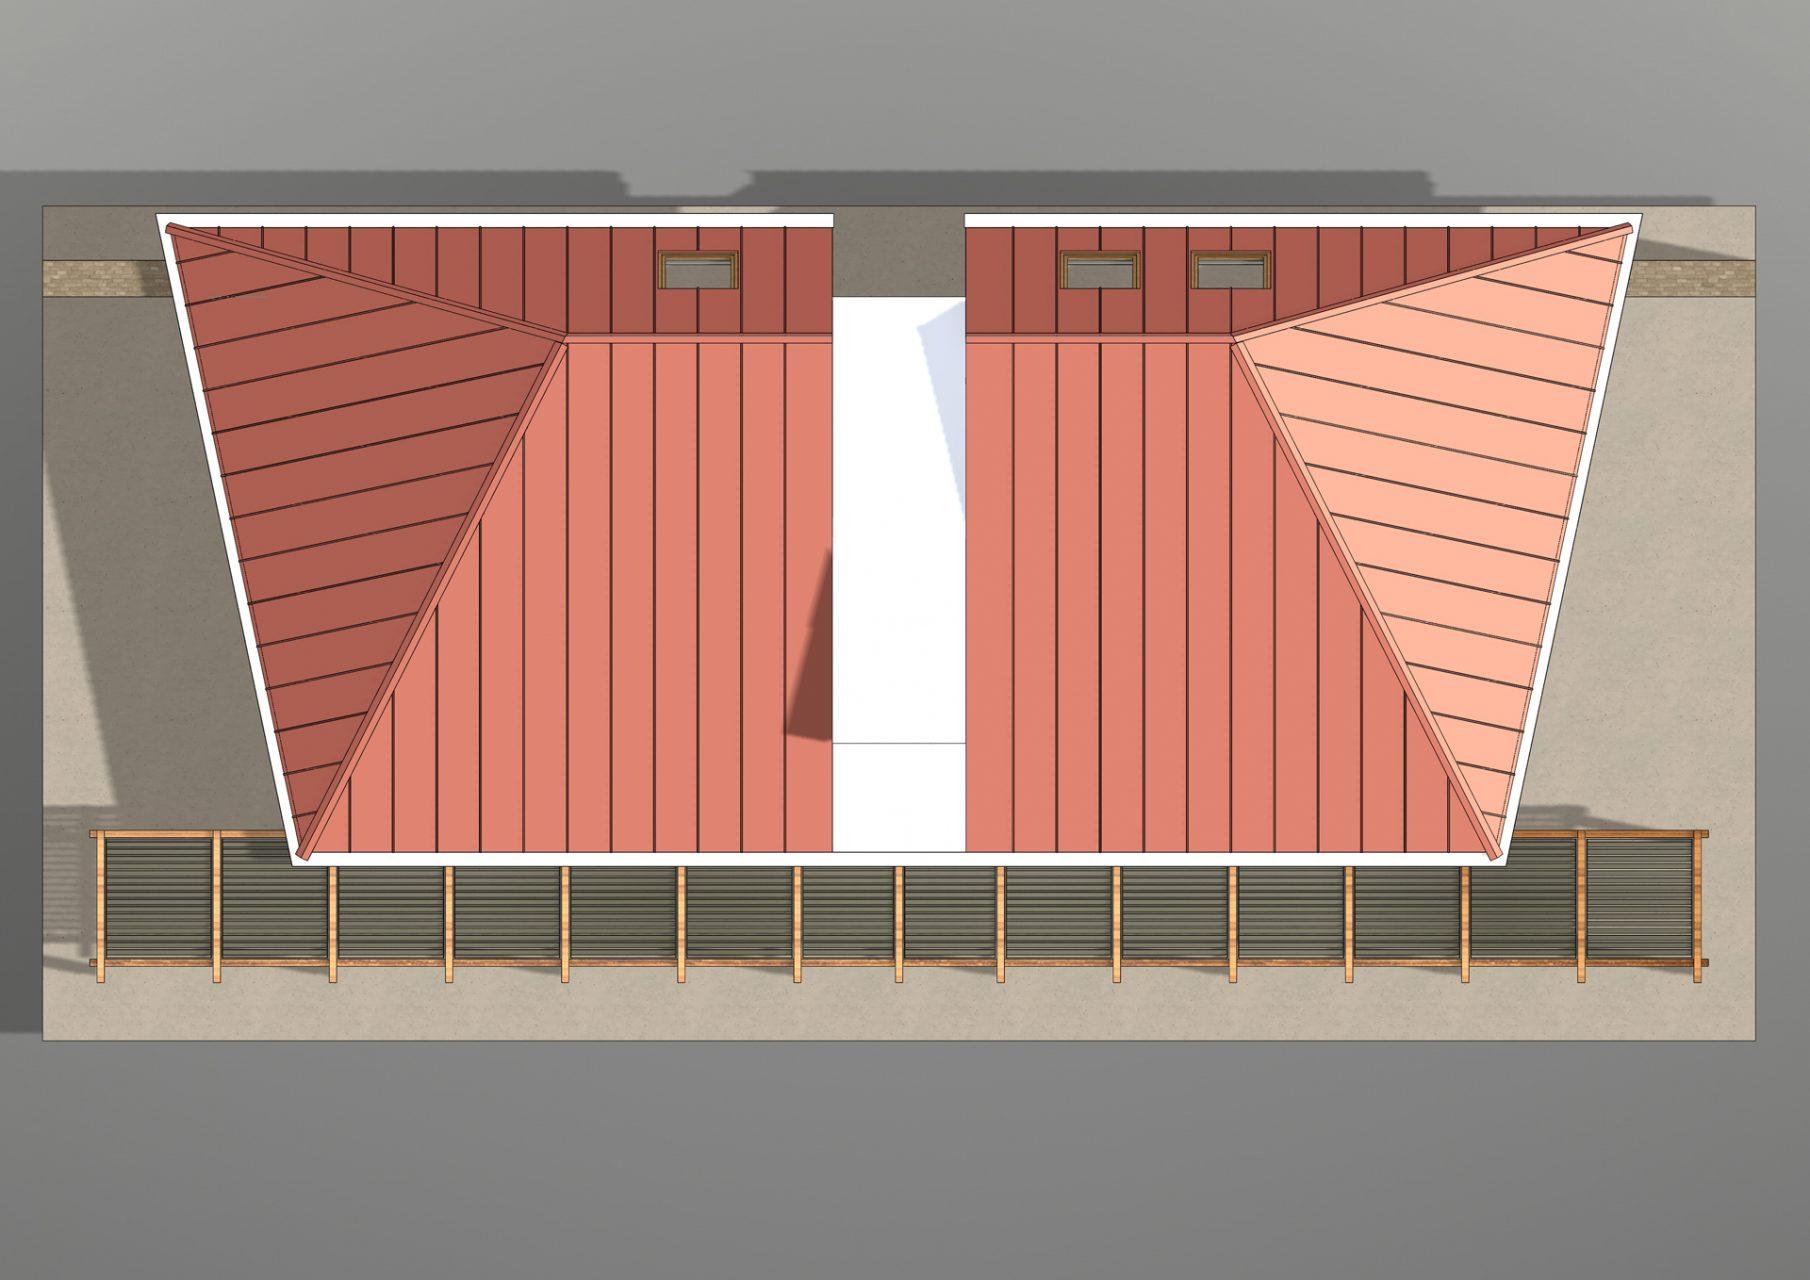 KL HOUSE 02 - general plan F